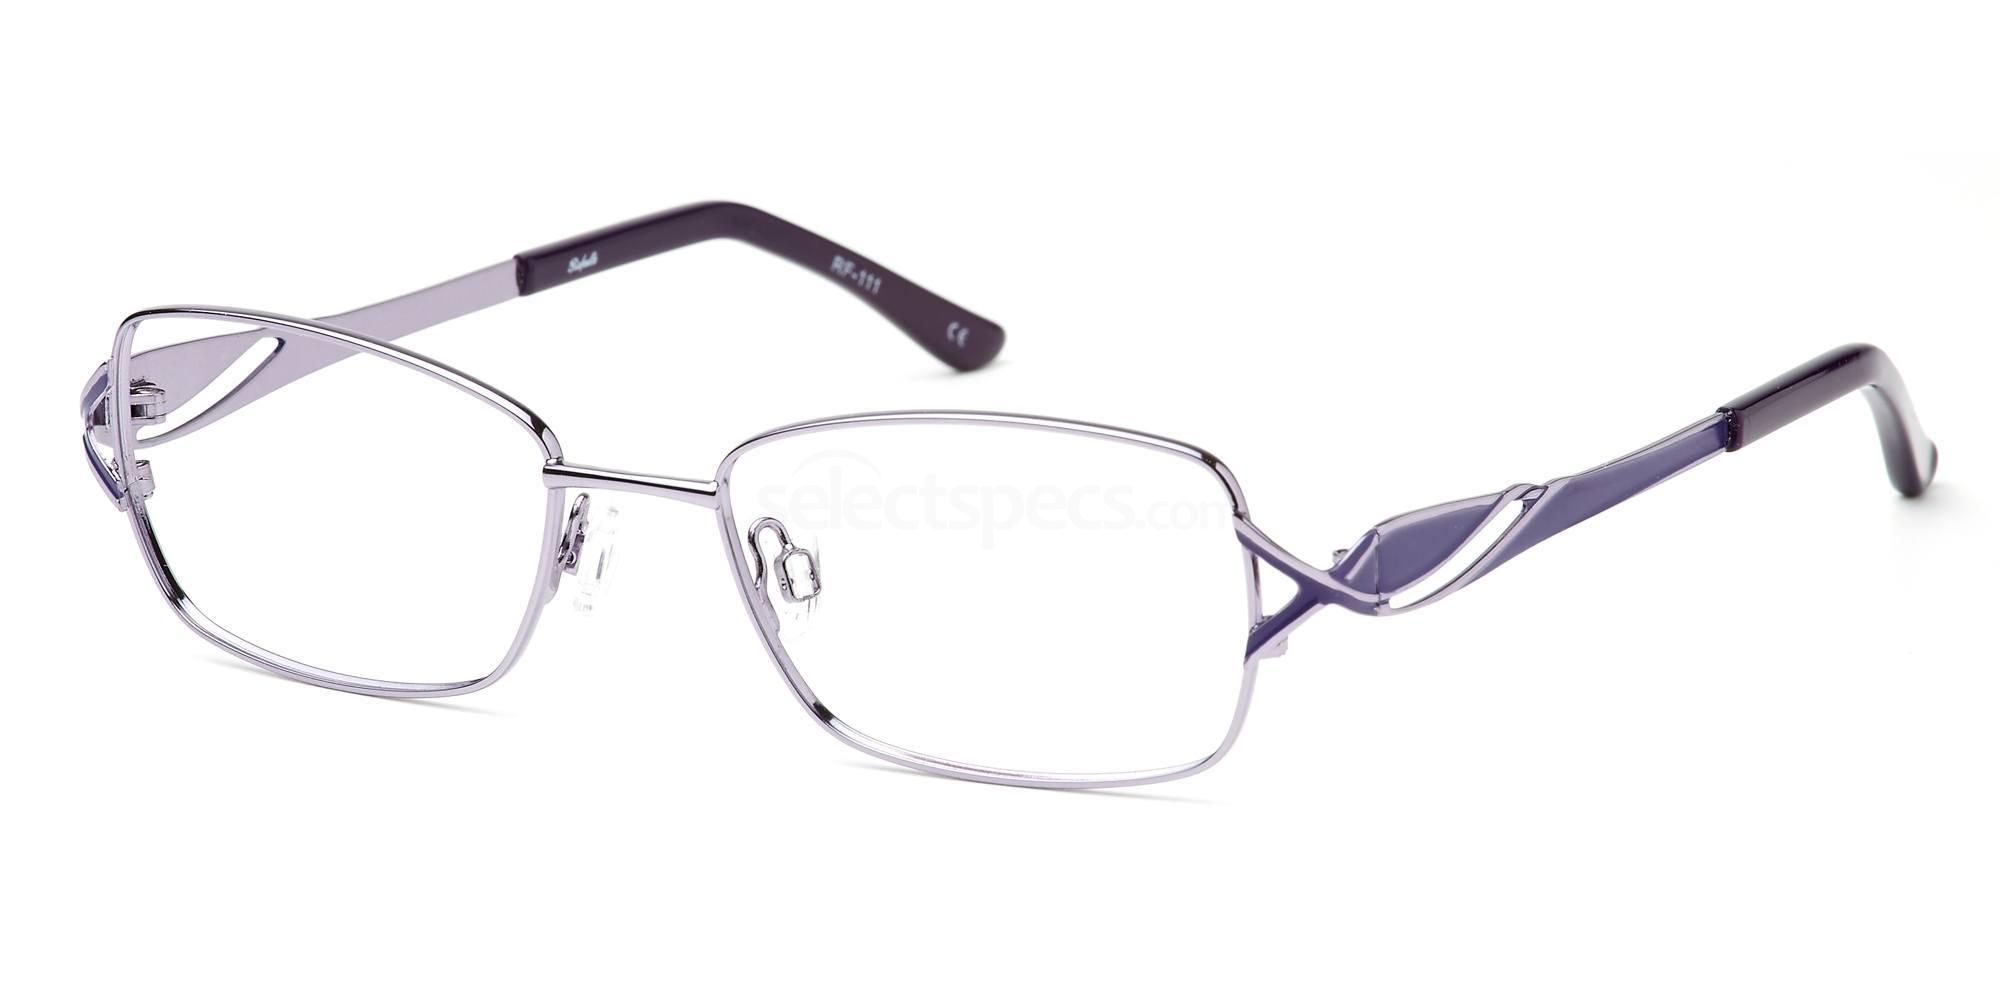 C1 RAF111 Glasses, Rafaelle